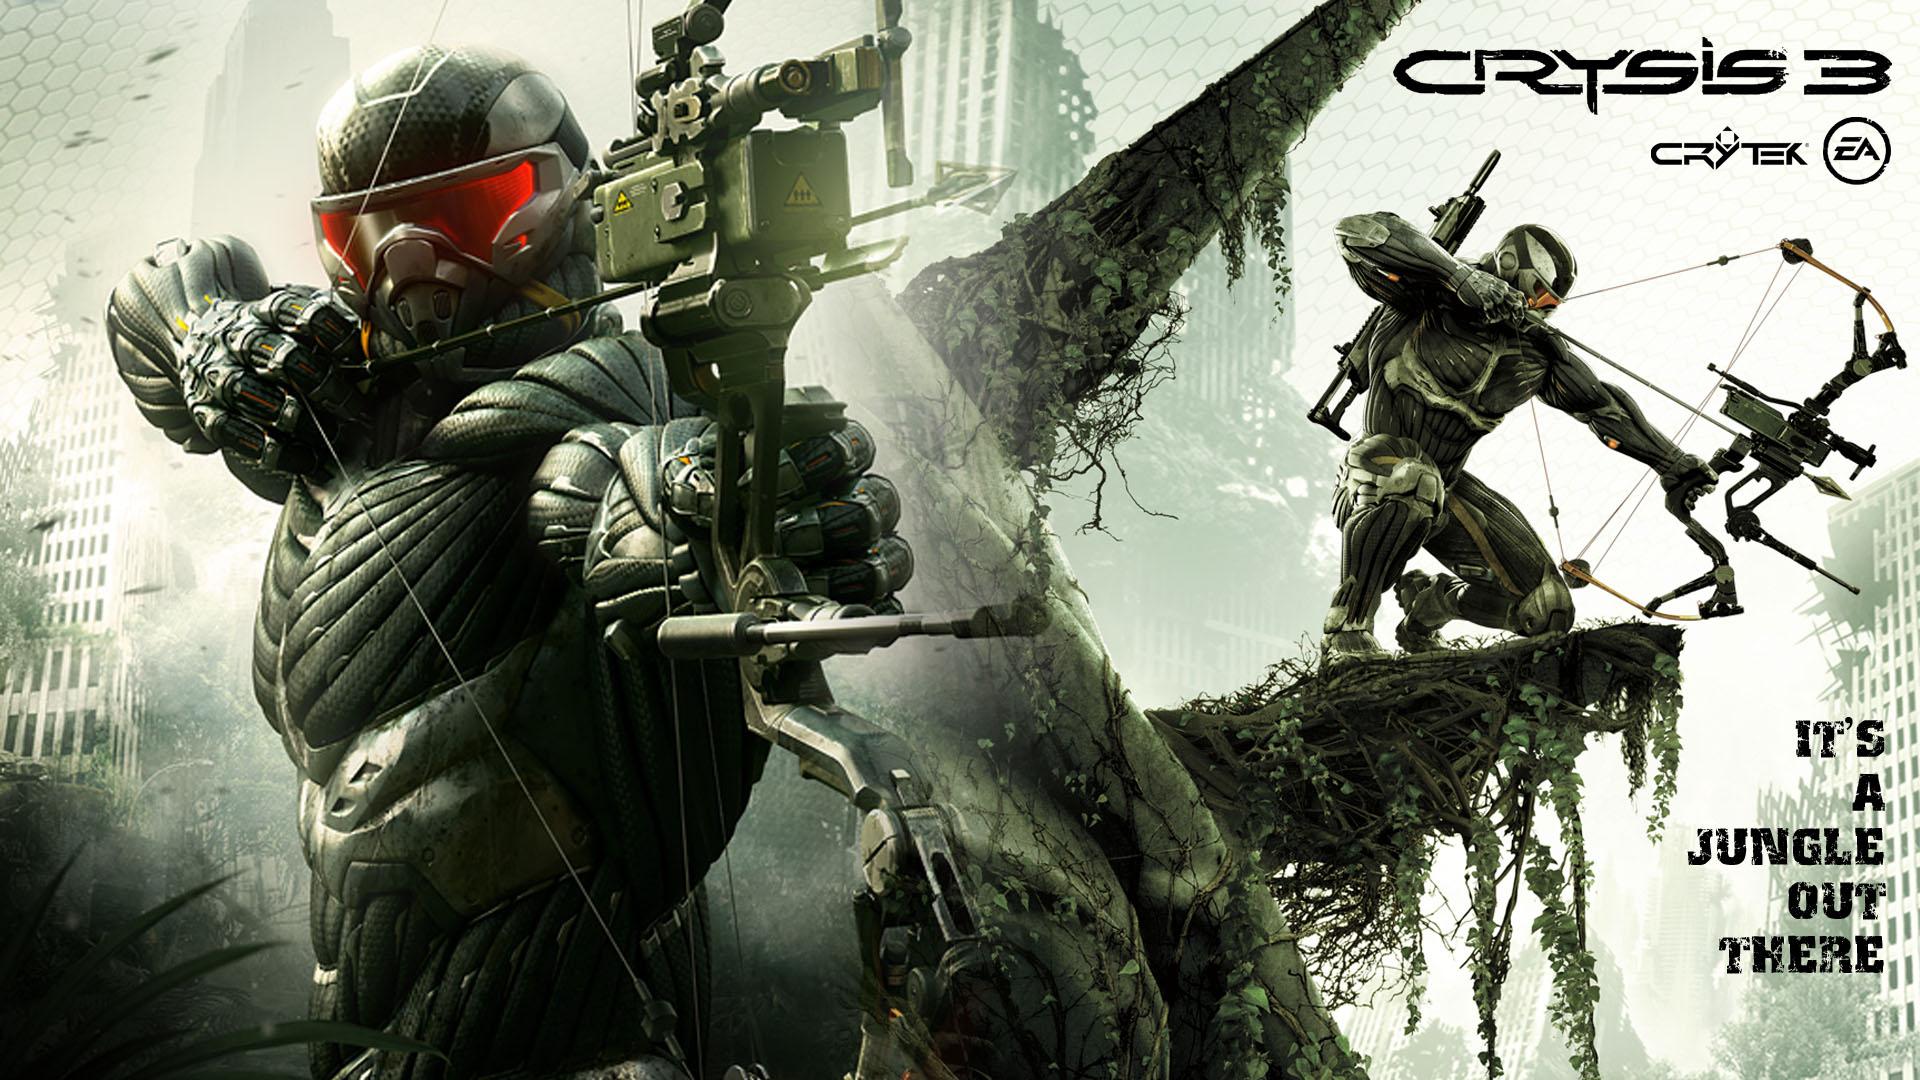 Crysis 3 Wallpapers